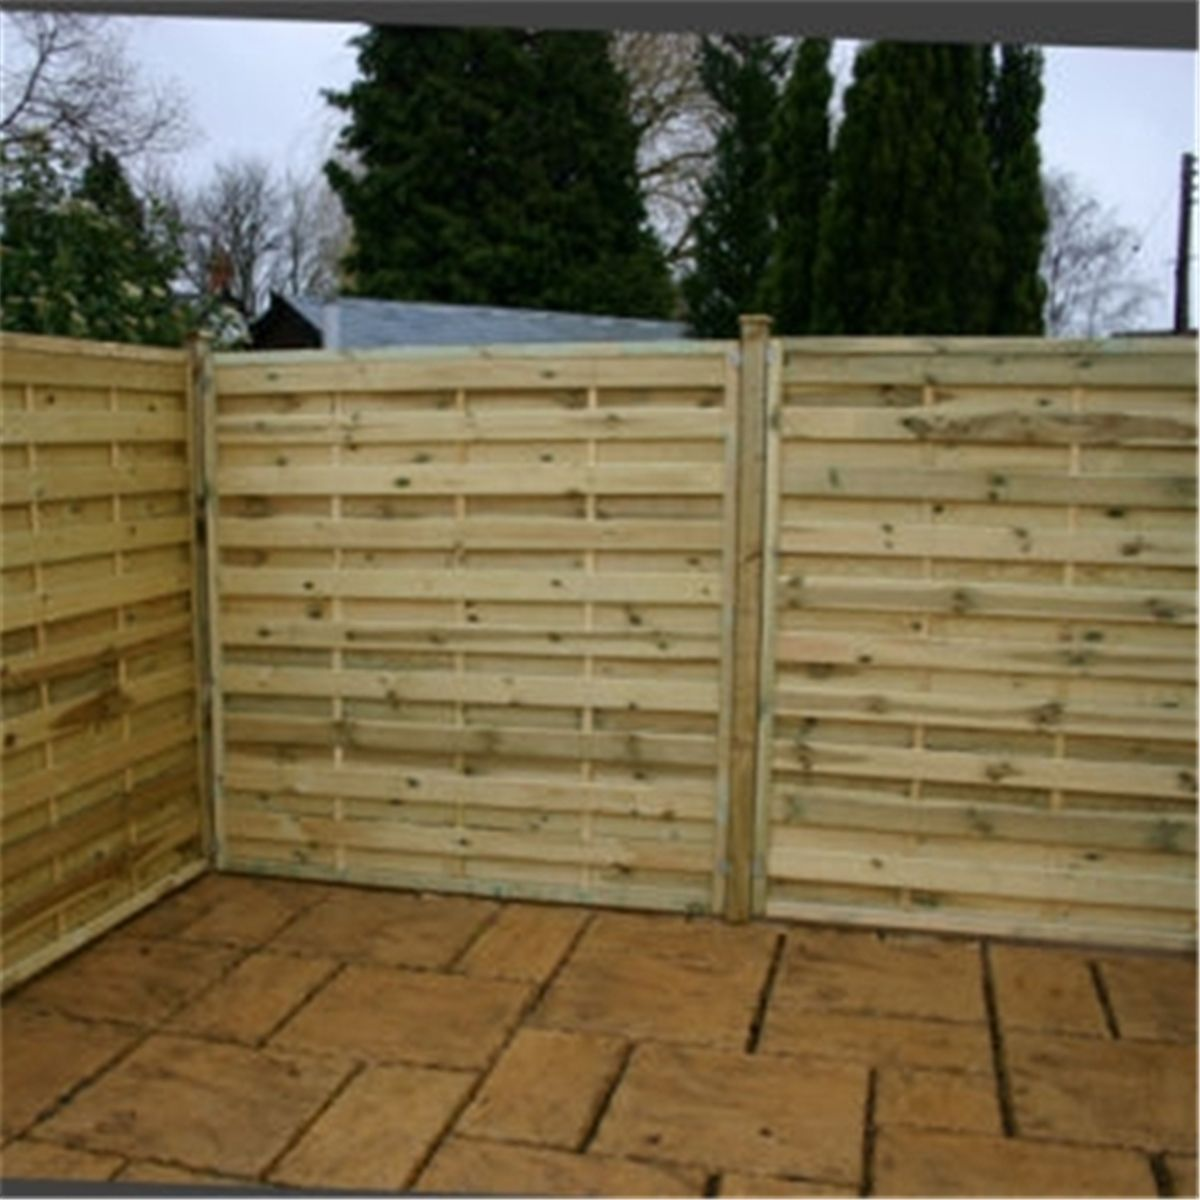 Horizontal Fence Panels Uk di 2020